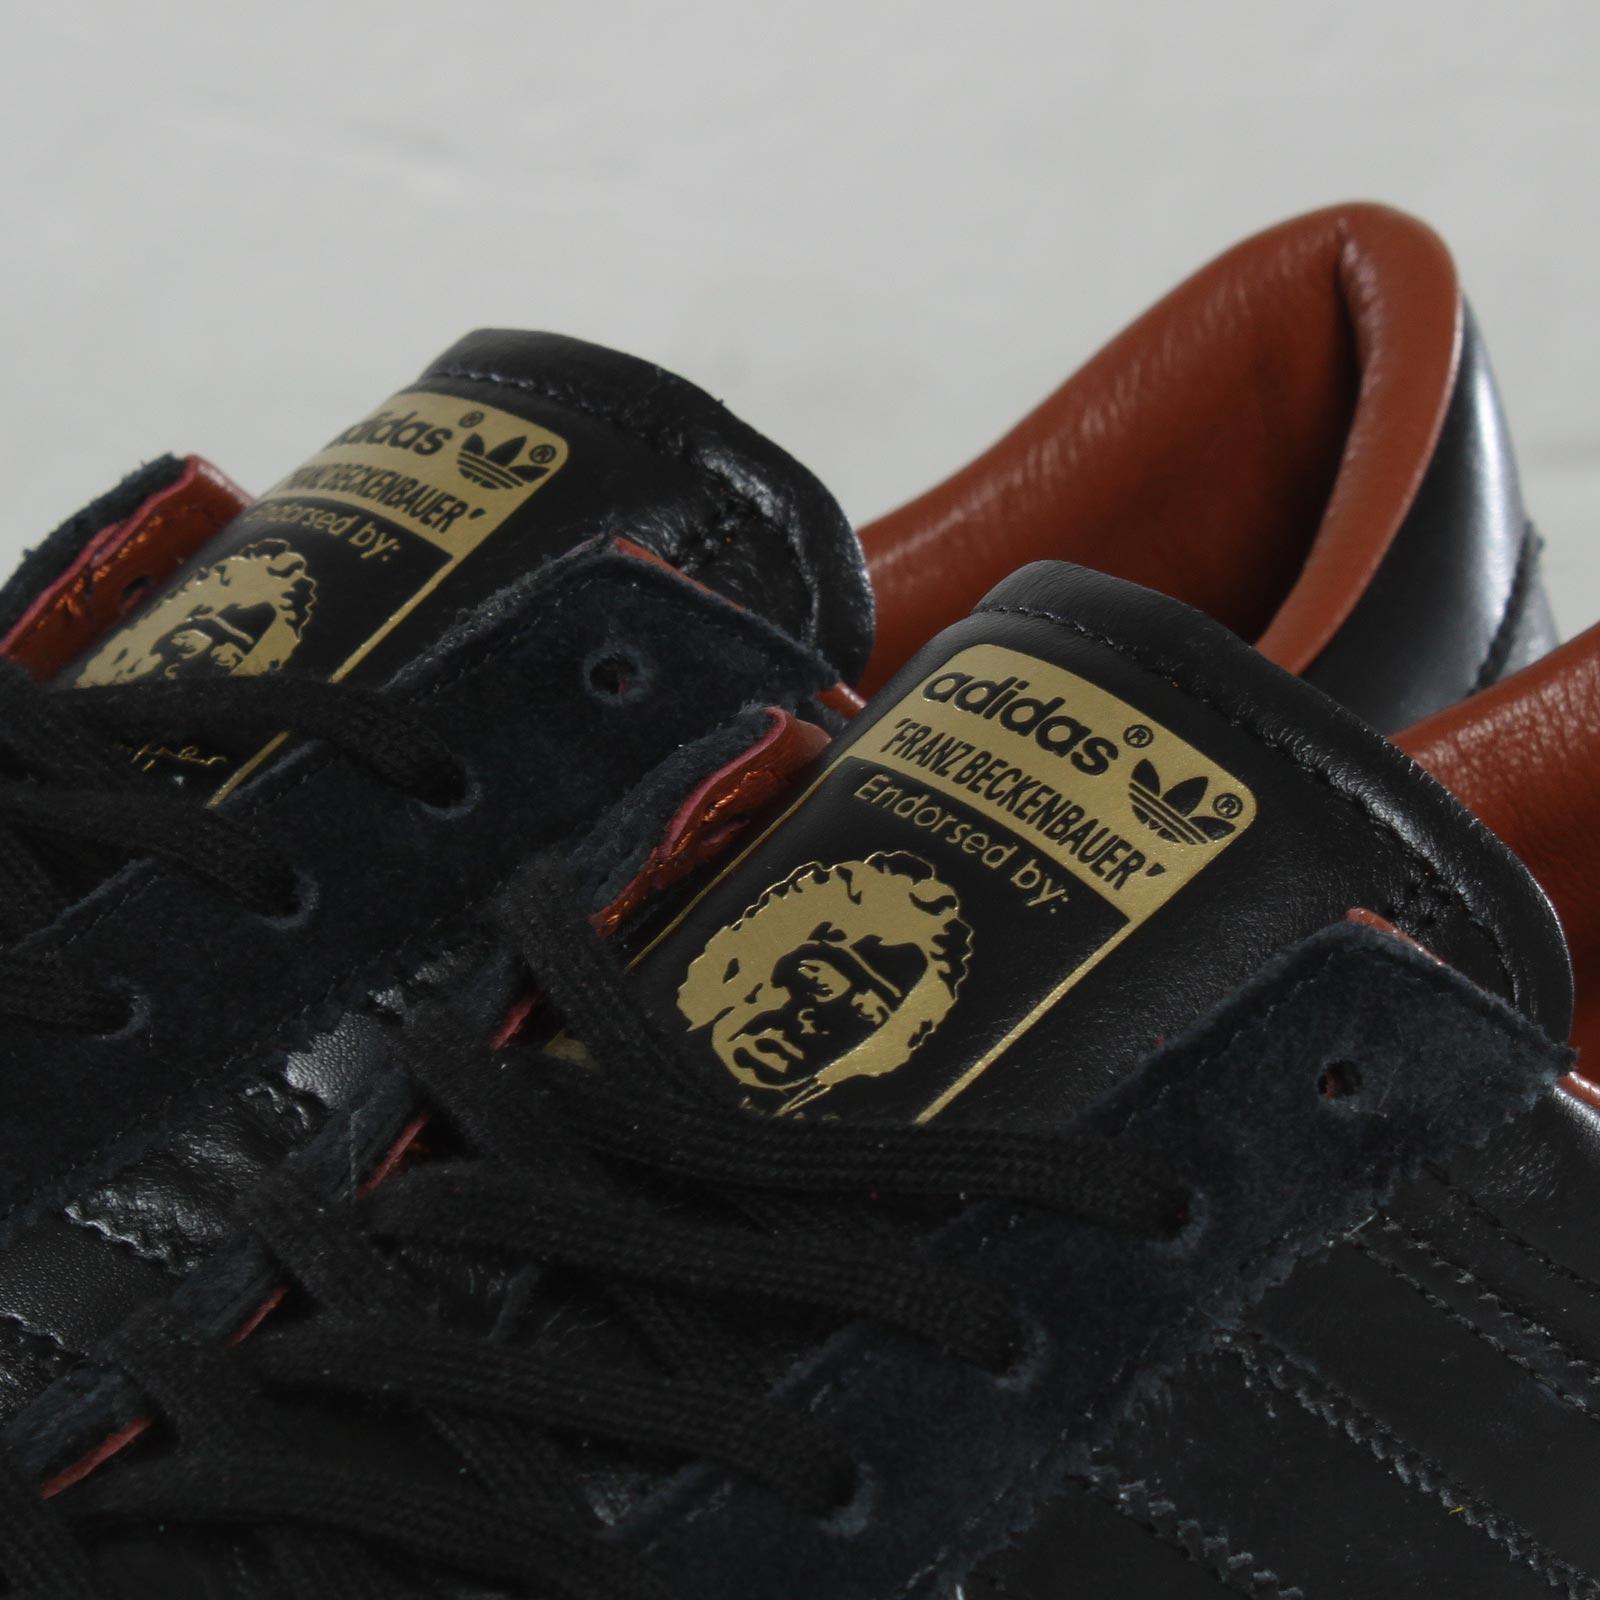 adidas Beckenbauer Premium - 108967 - SNS | sneakers & streetwear ...